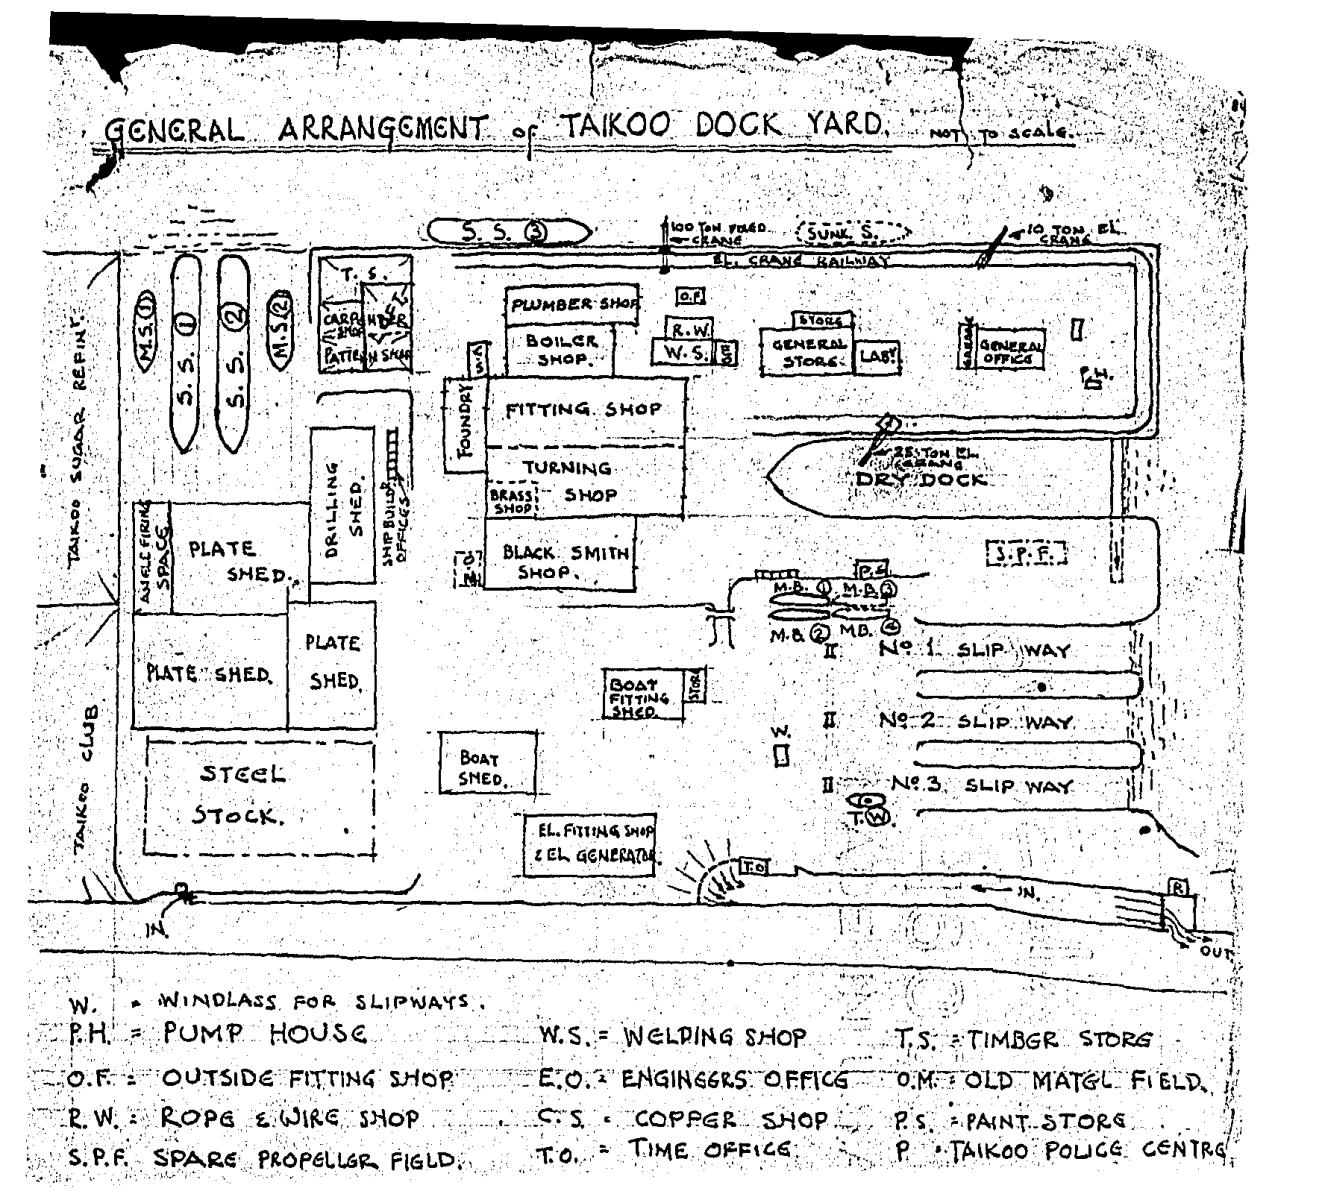 Taikoo Dockyard KIS #2 13.7.42 map